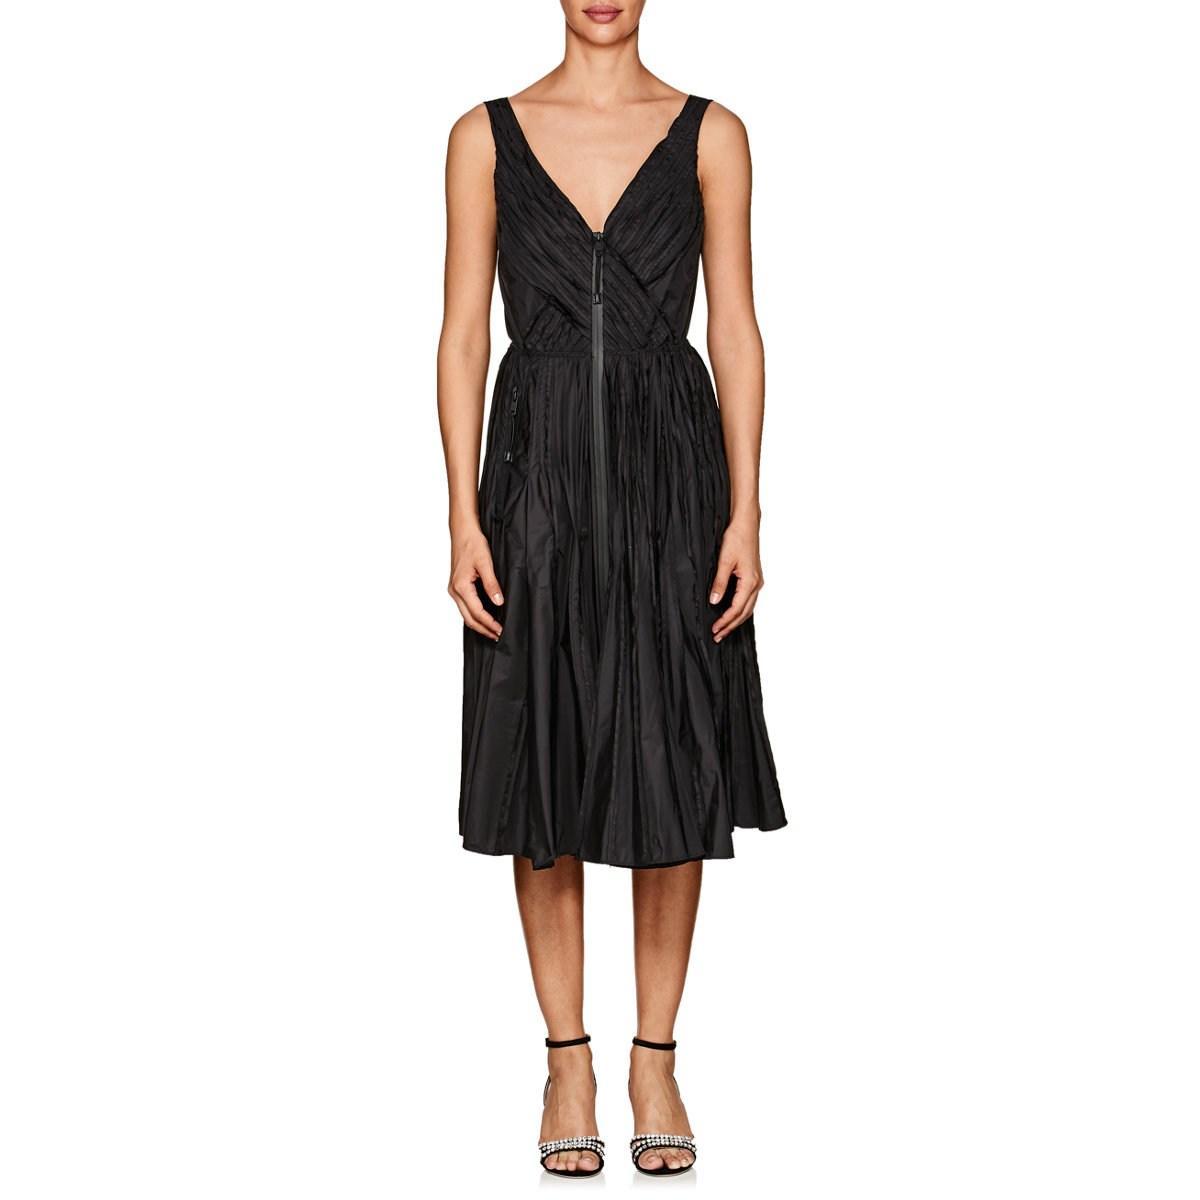 d7f53e7585 Prada Pleated Tech-taffeta A-line Dress in Black - Save 74% - Lyst